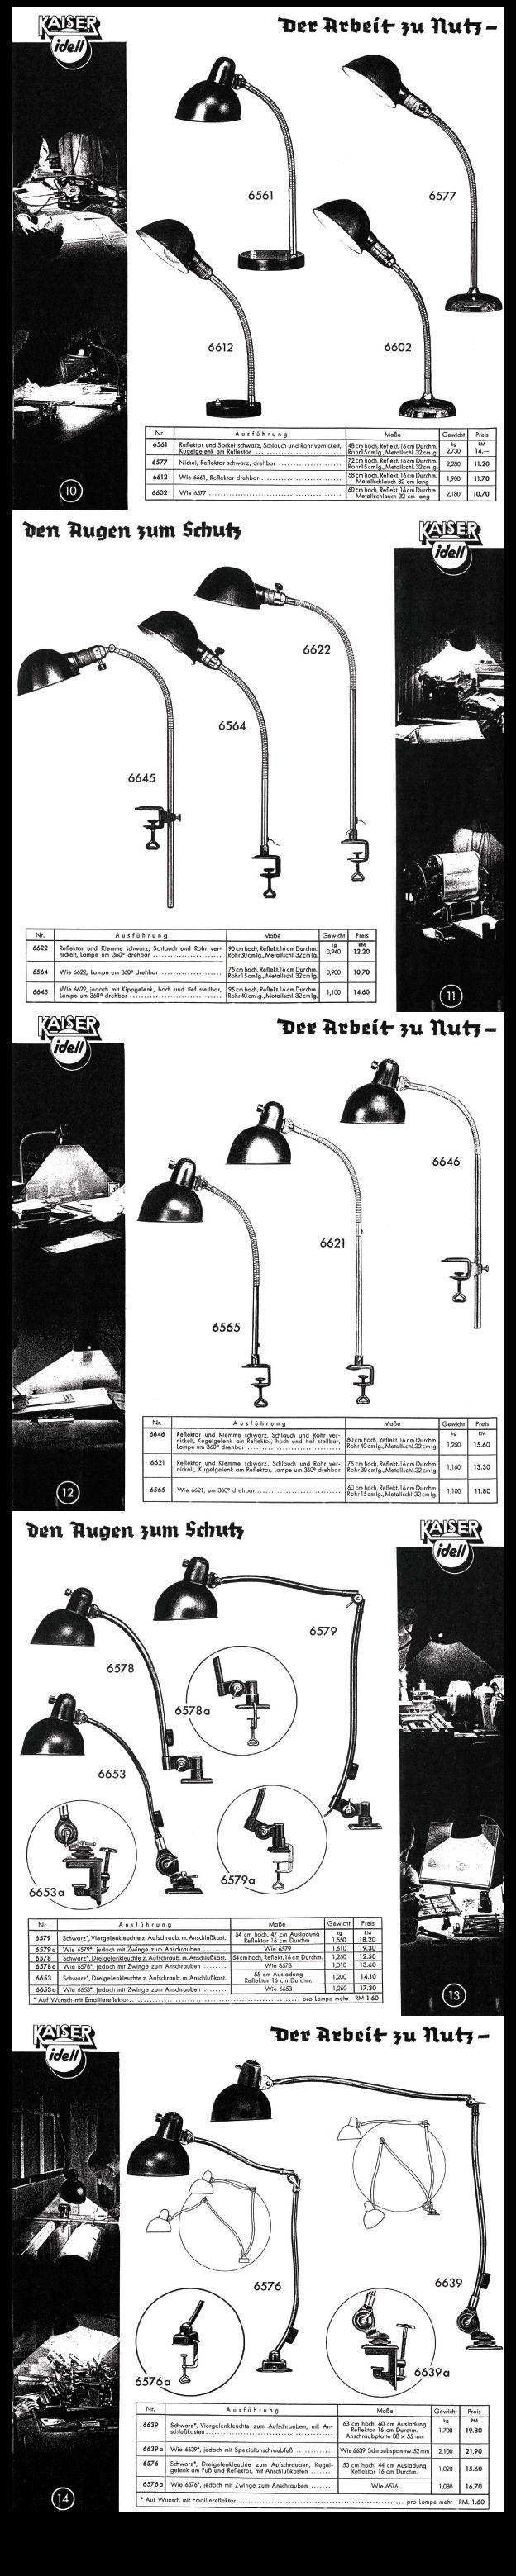 Rare Kaiser & Co. Work Lamp Catalogue 1936 - Pages 10 to 14 #KaiserIdell #Kaiser_Idell #ChristianDell #Bauhaus #Modernism #Modernist #Molecula